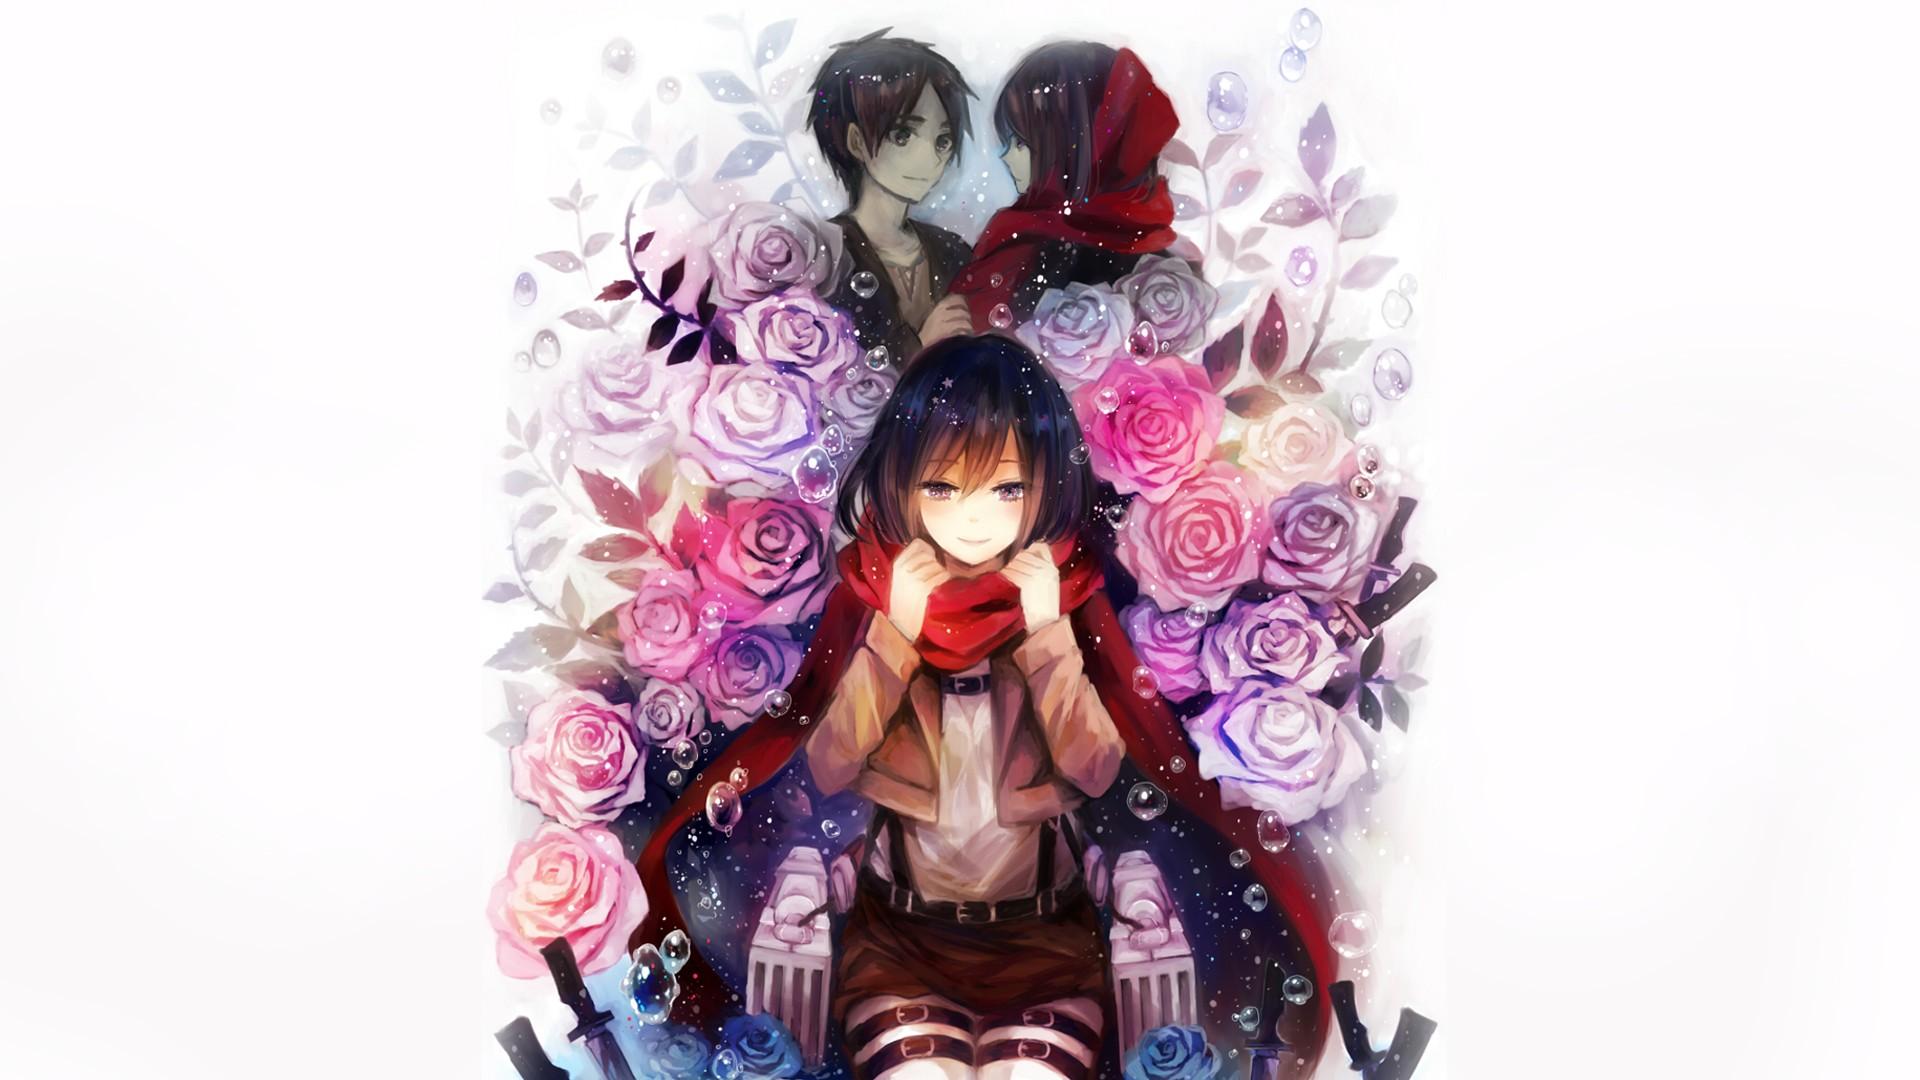 Wallpaper Anime Shingeki No Kyojin Eren Jeager Mikasa Ackerman Toy Doll Costume 1920x1080 Px 1920x1080 4kwallpaper 539375 Hd Wallpapers Wallhere